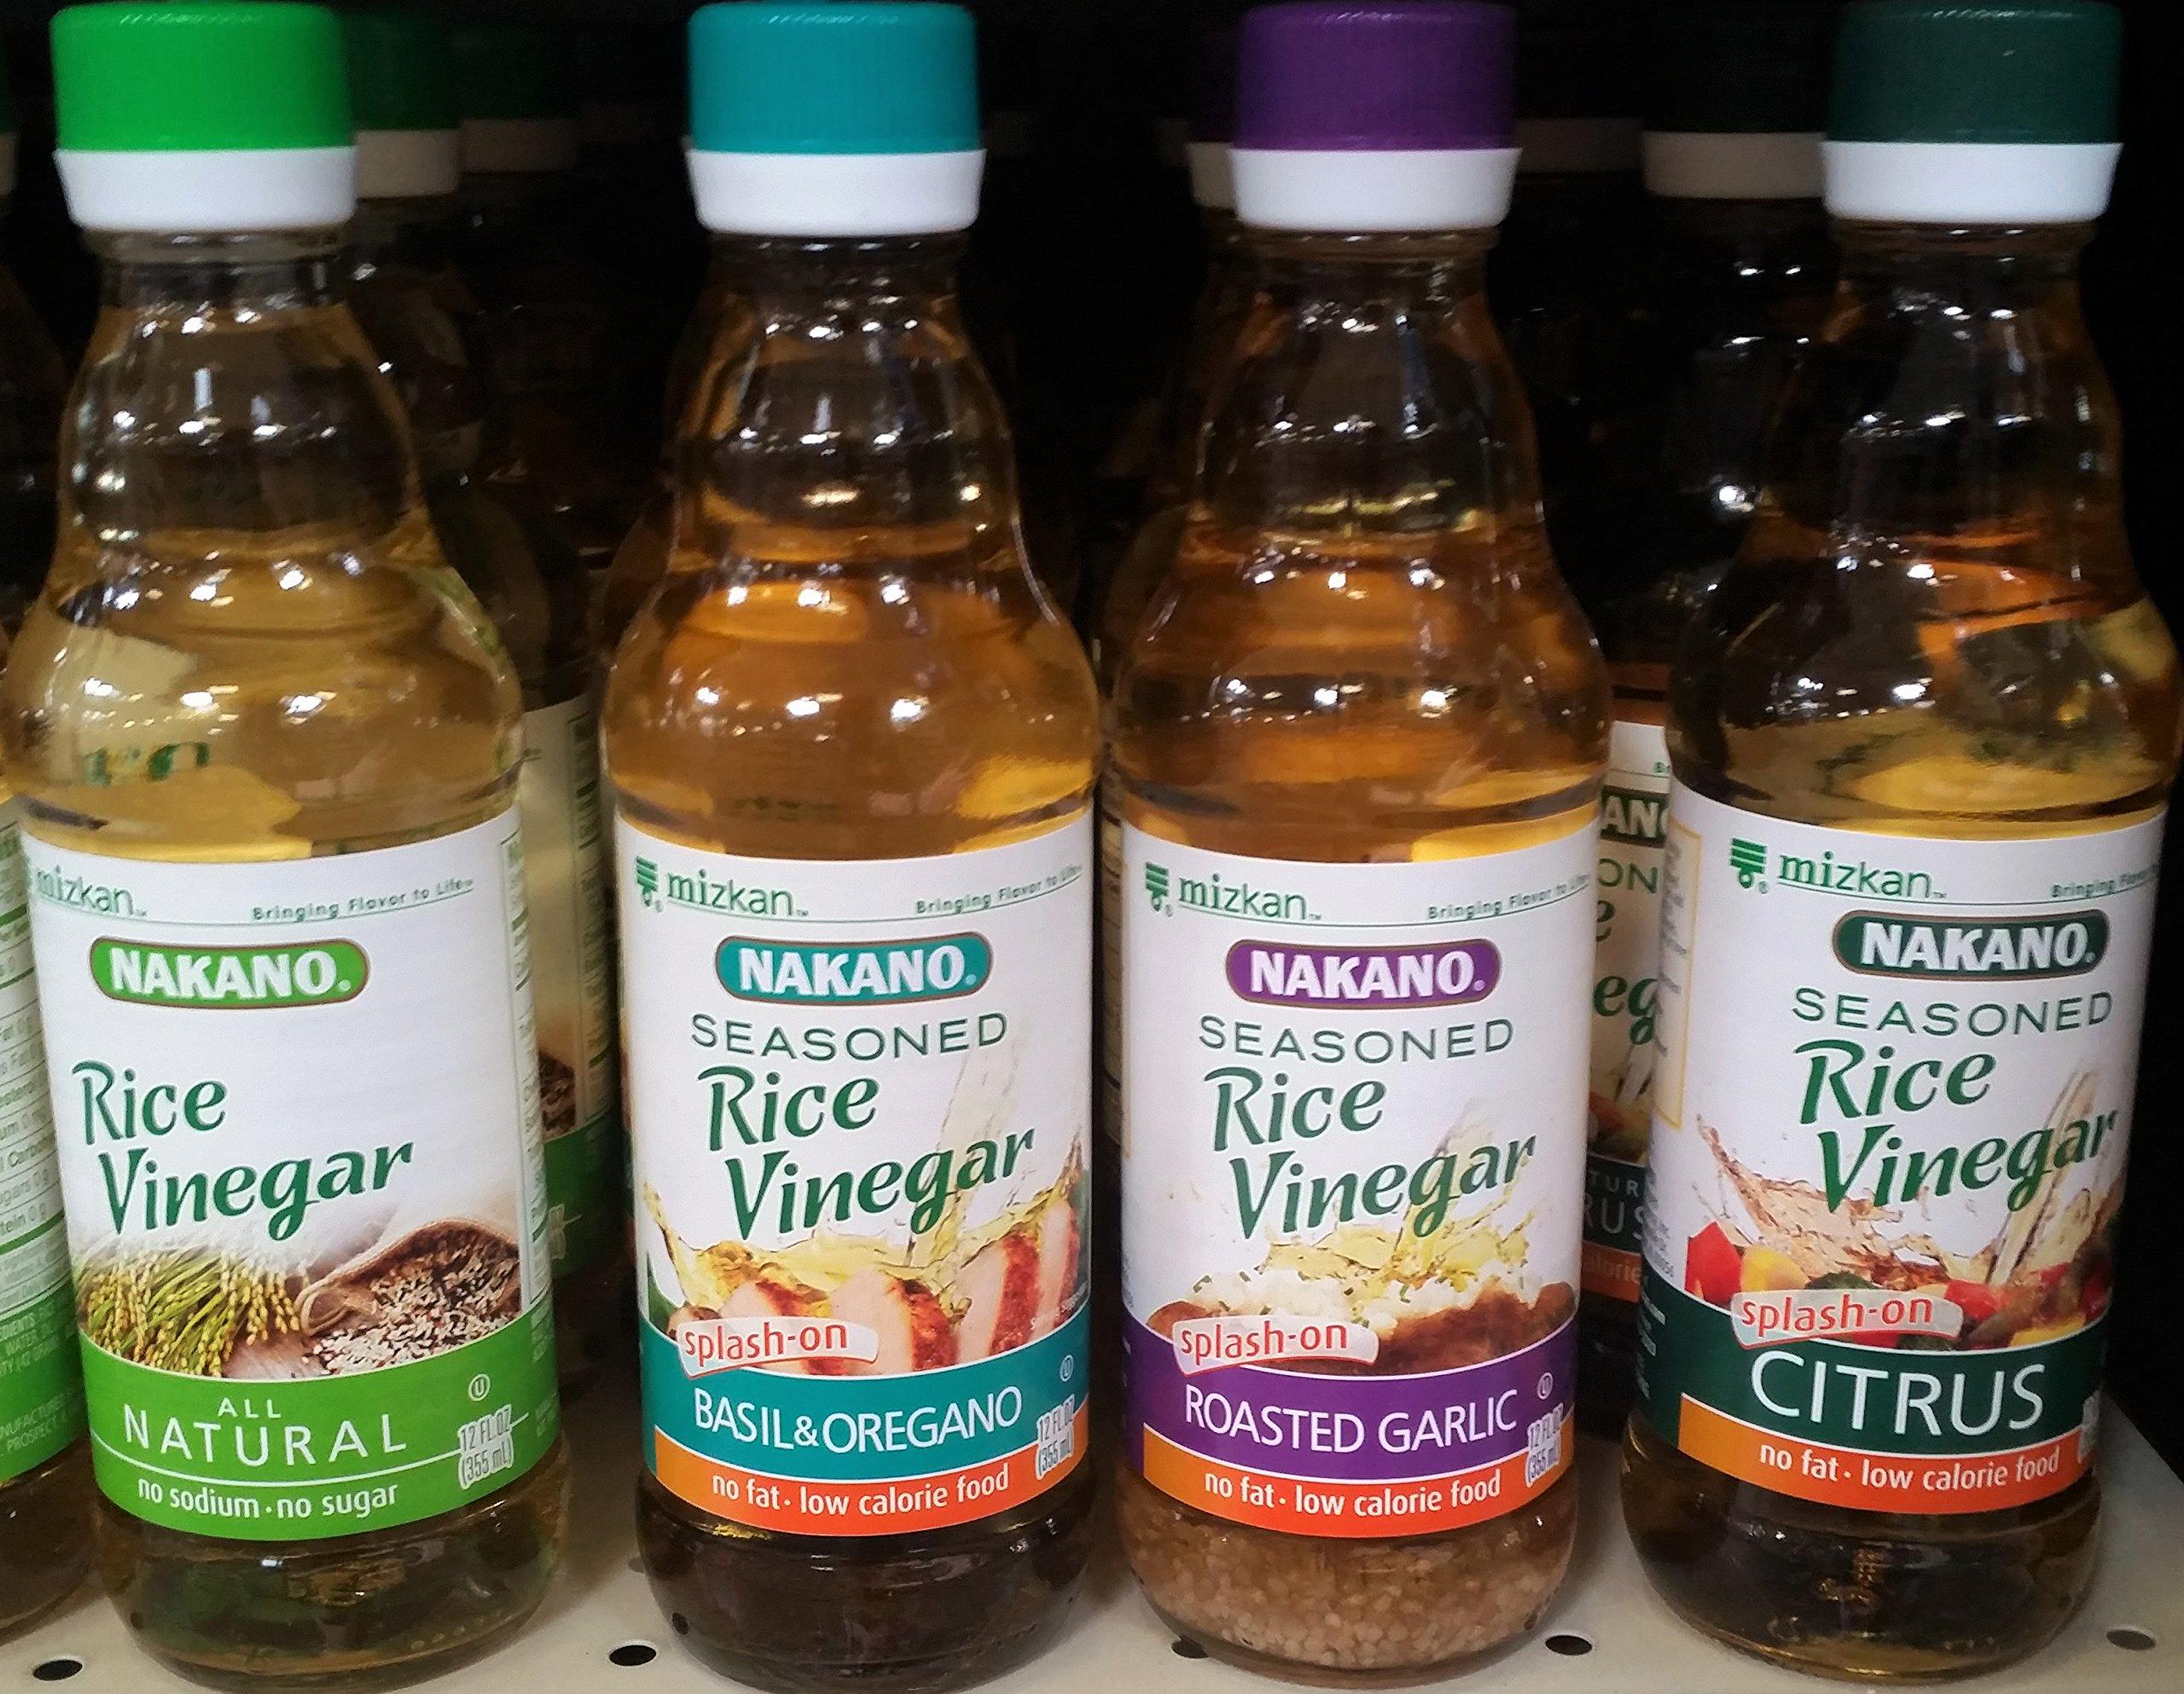 Nakano Rice Vinegar Variety Pack 12 oz (Pack of 4)